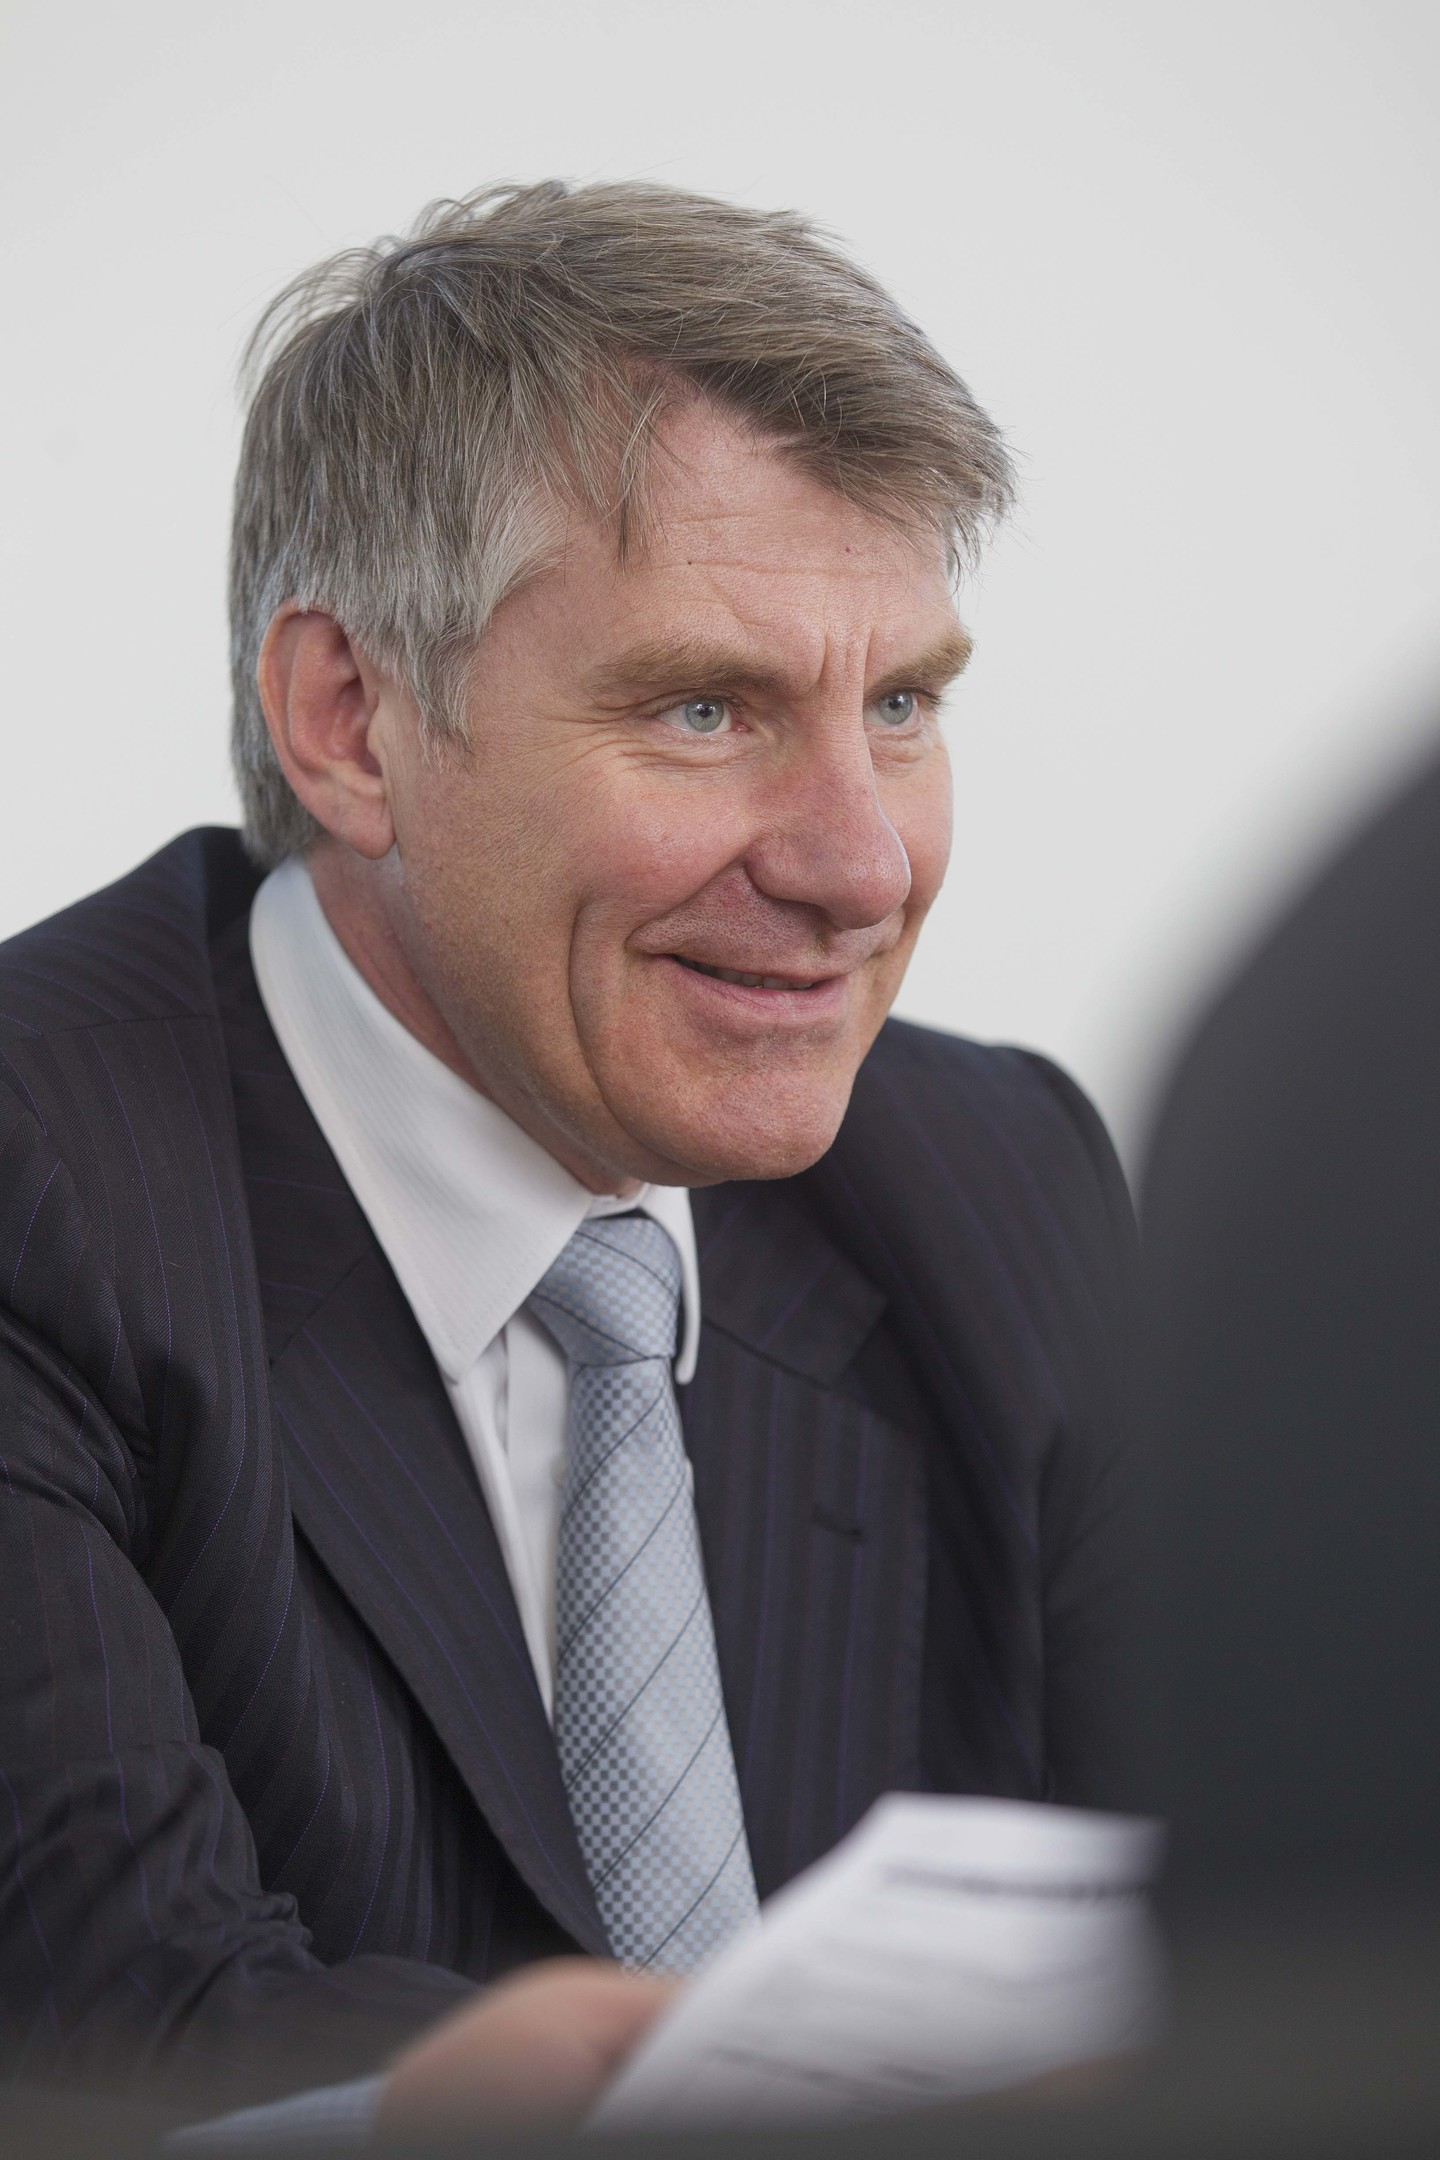 ICR's Bill Bayliss